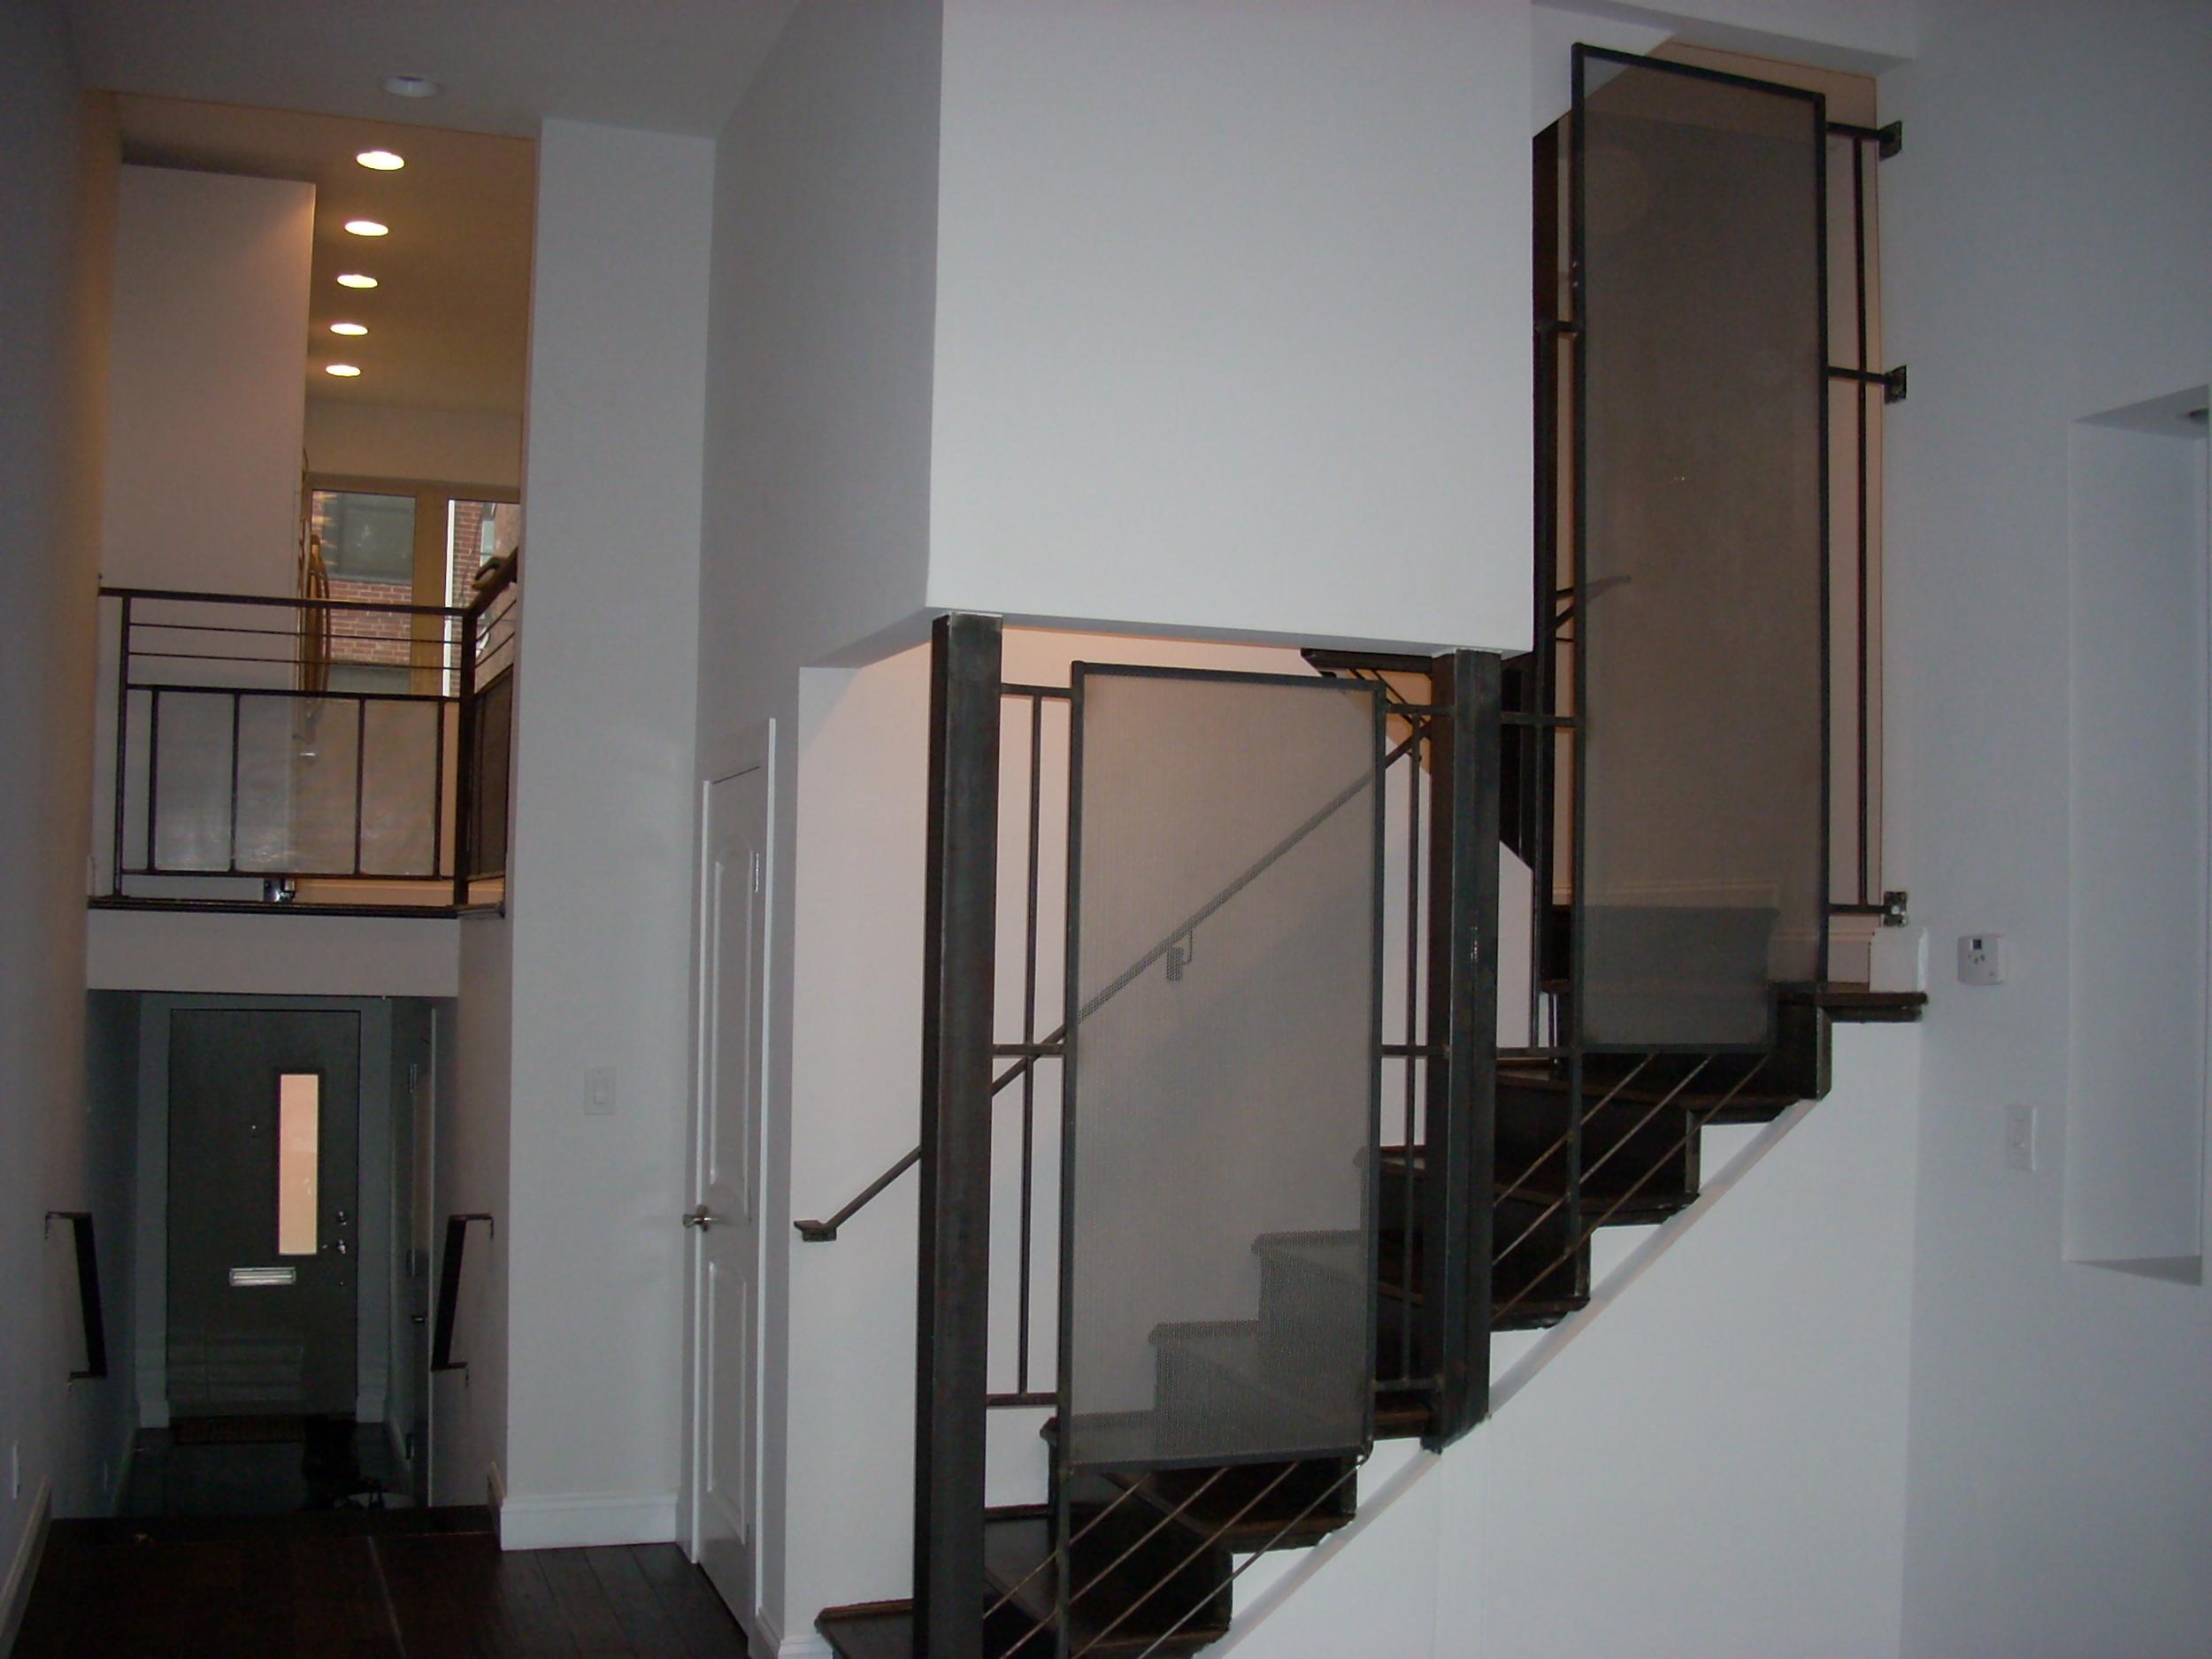 Industrial perforated steel railing